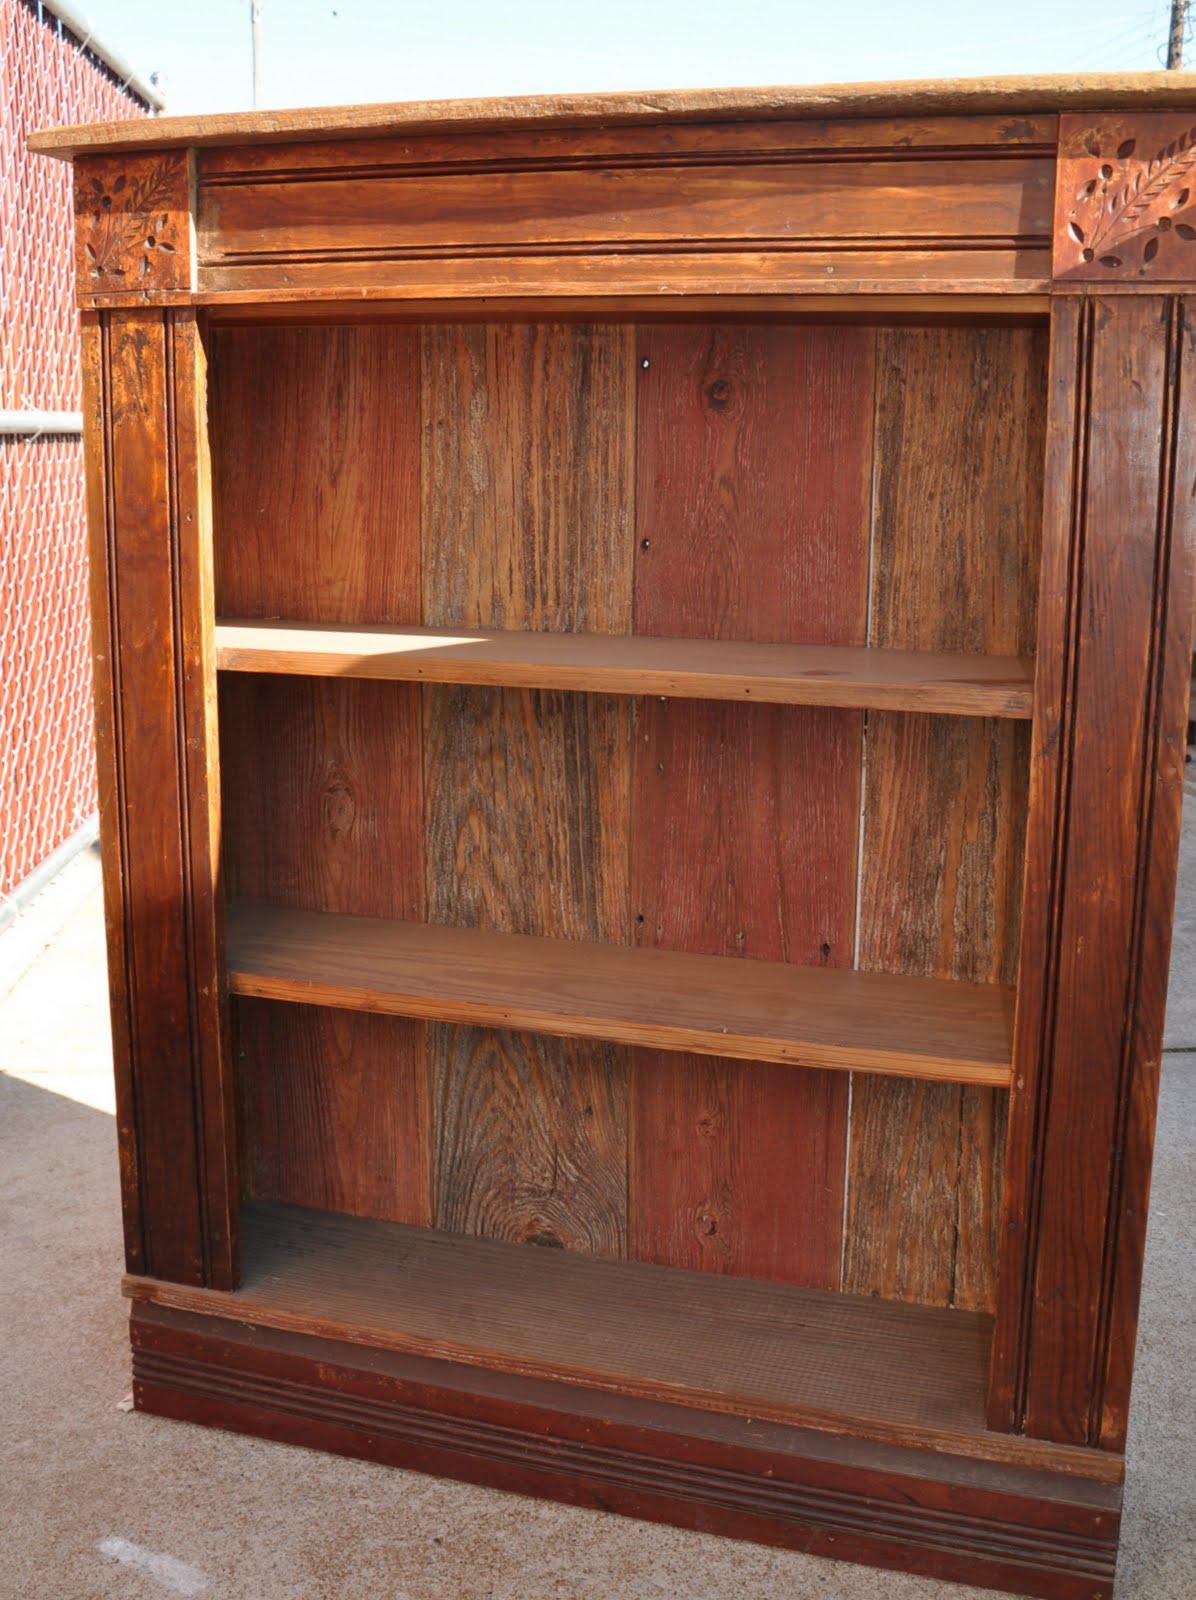 Barn Wood Shelves ~ Barn wood shelves